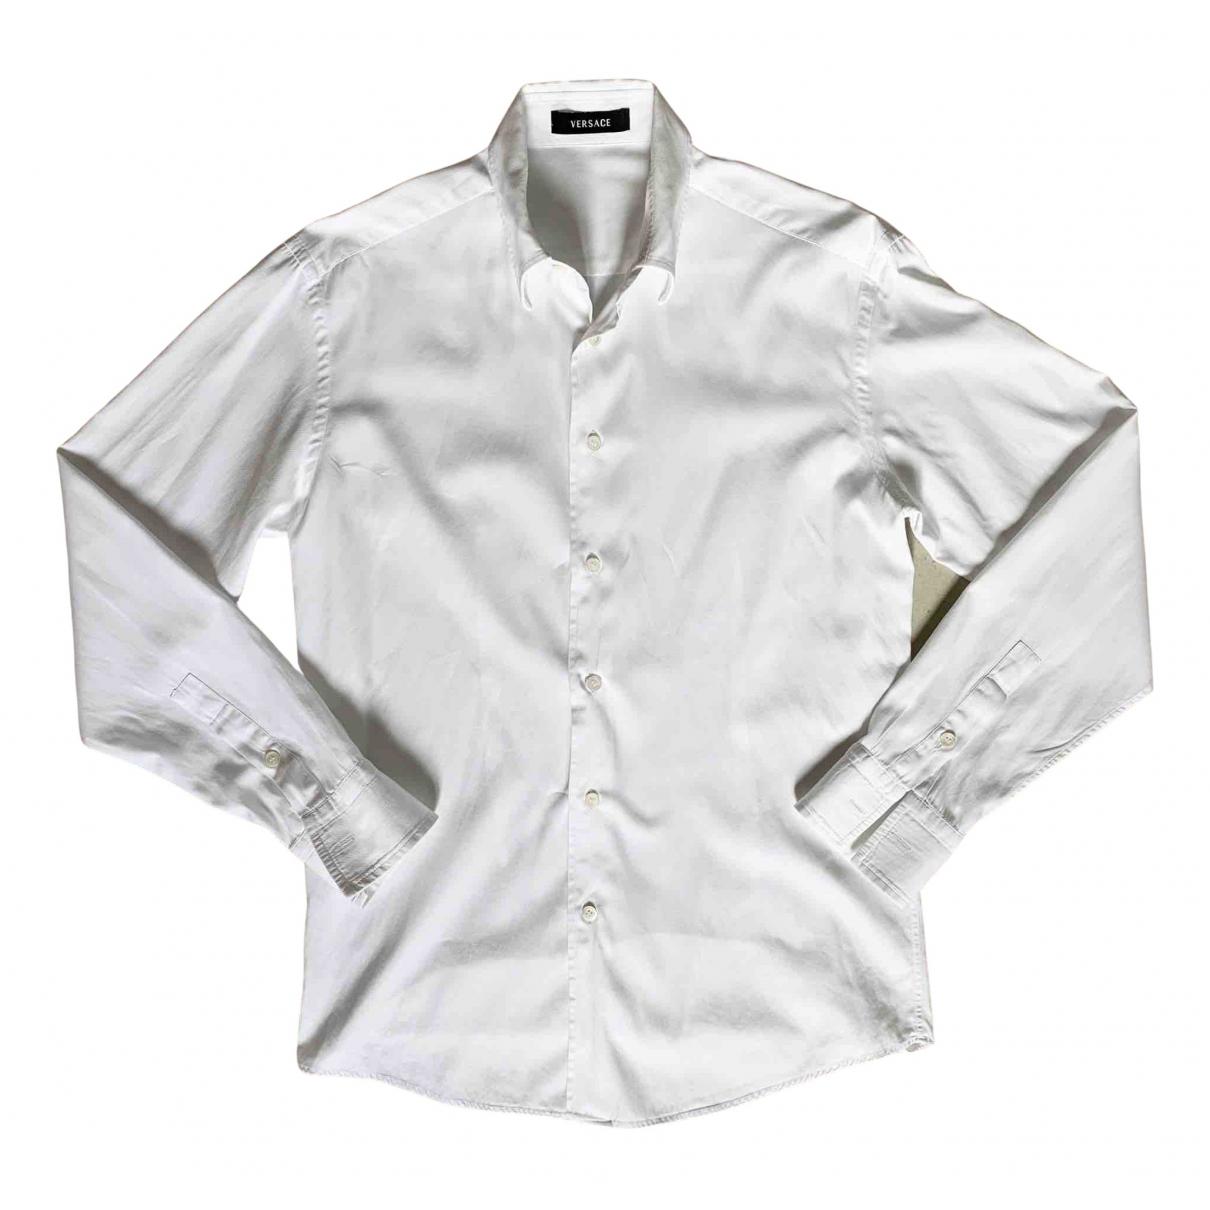 Versace N White Cotton Shirts for Men S International